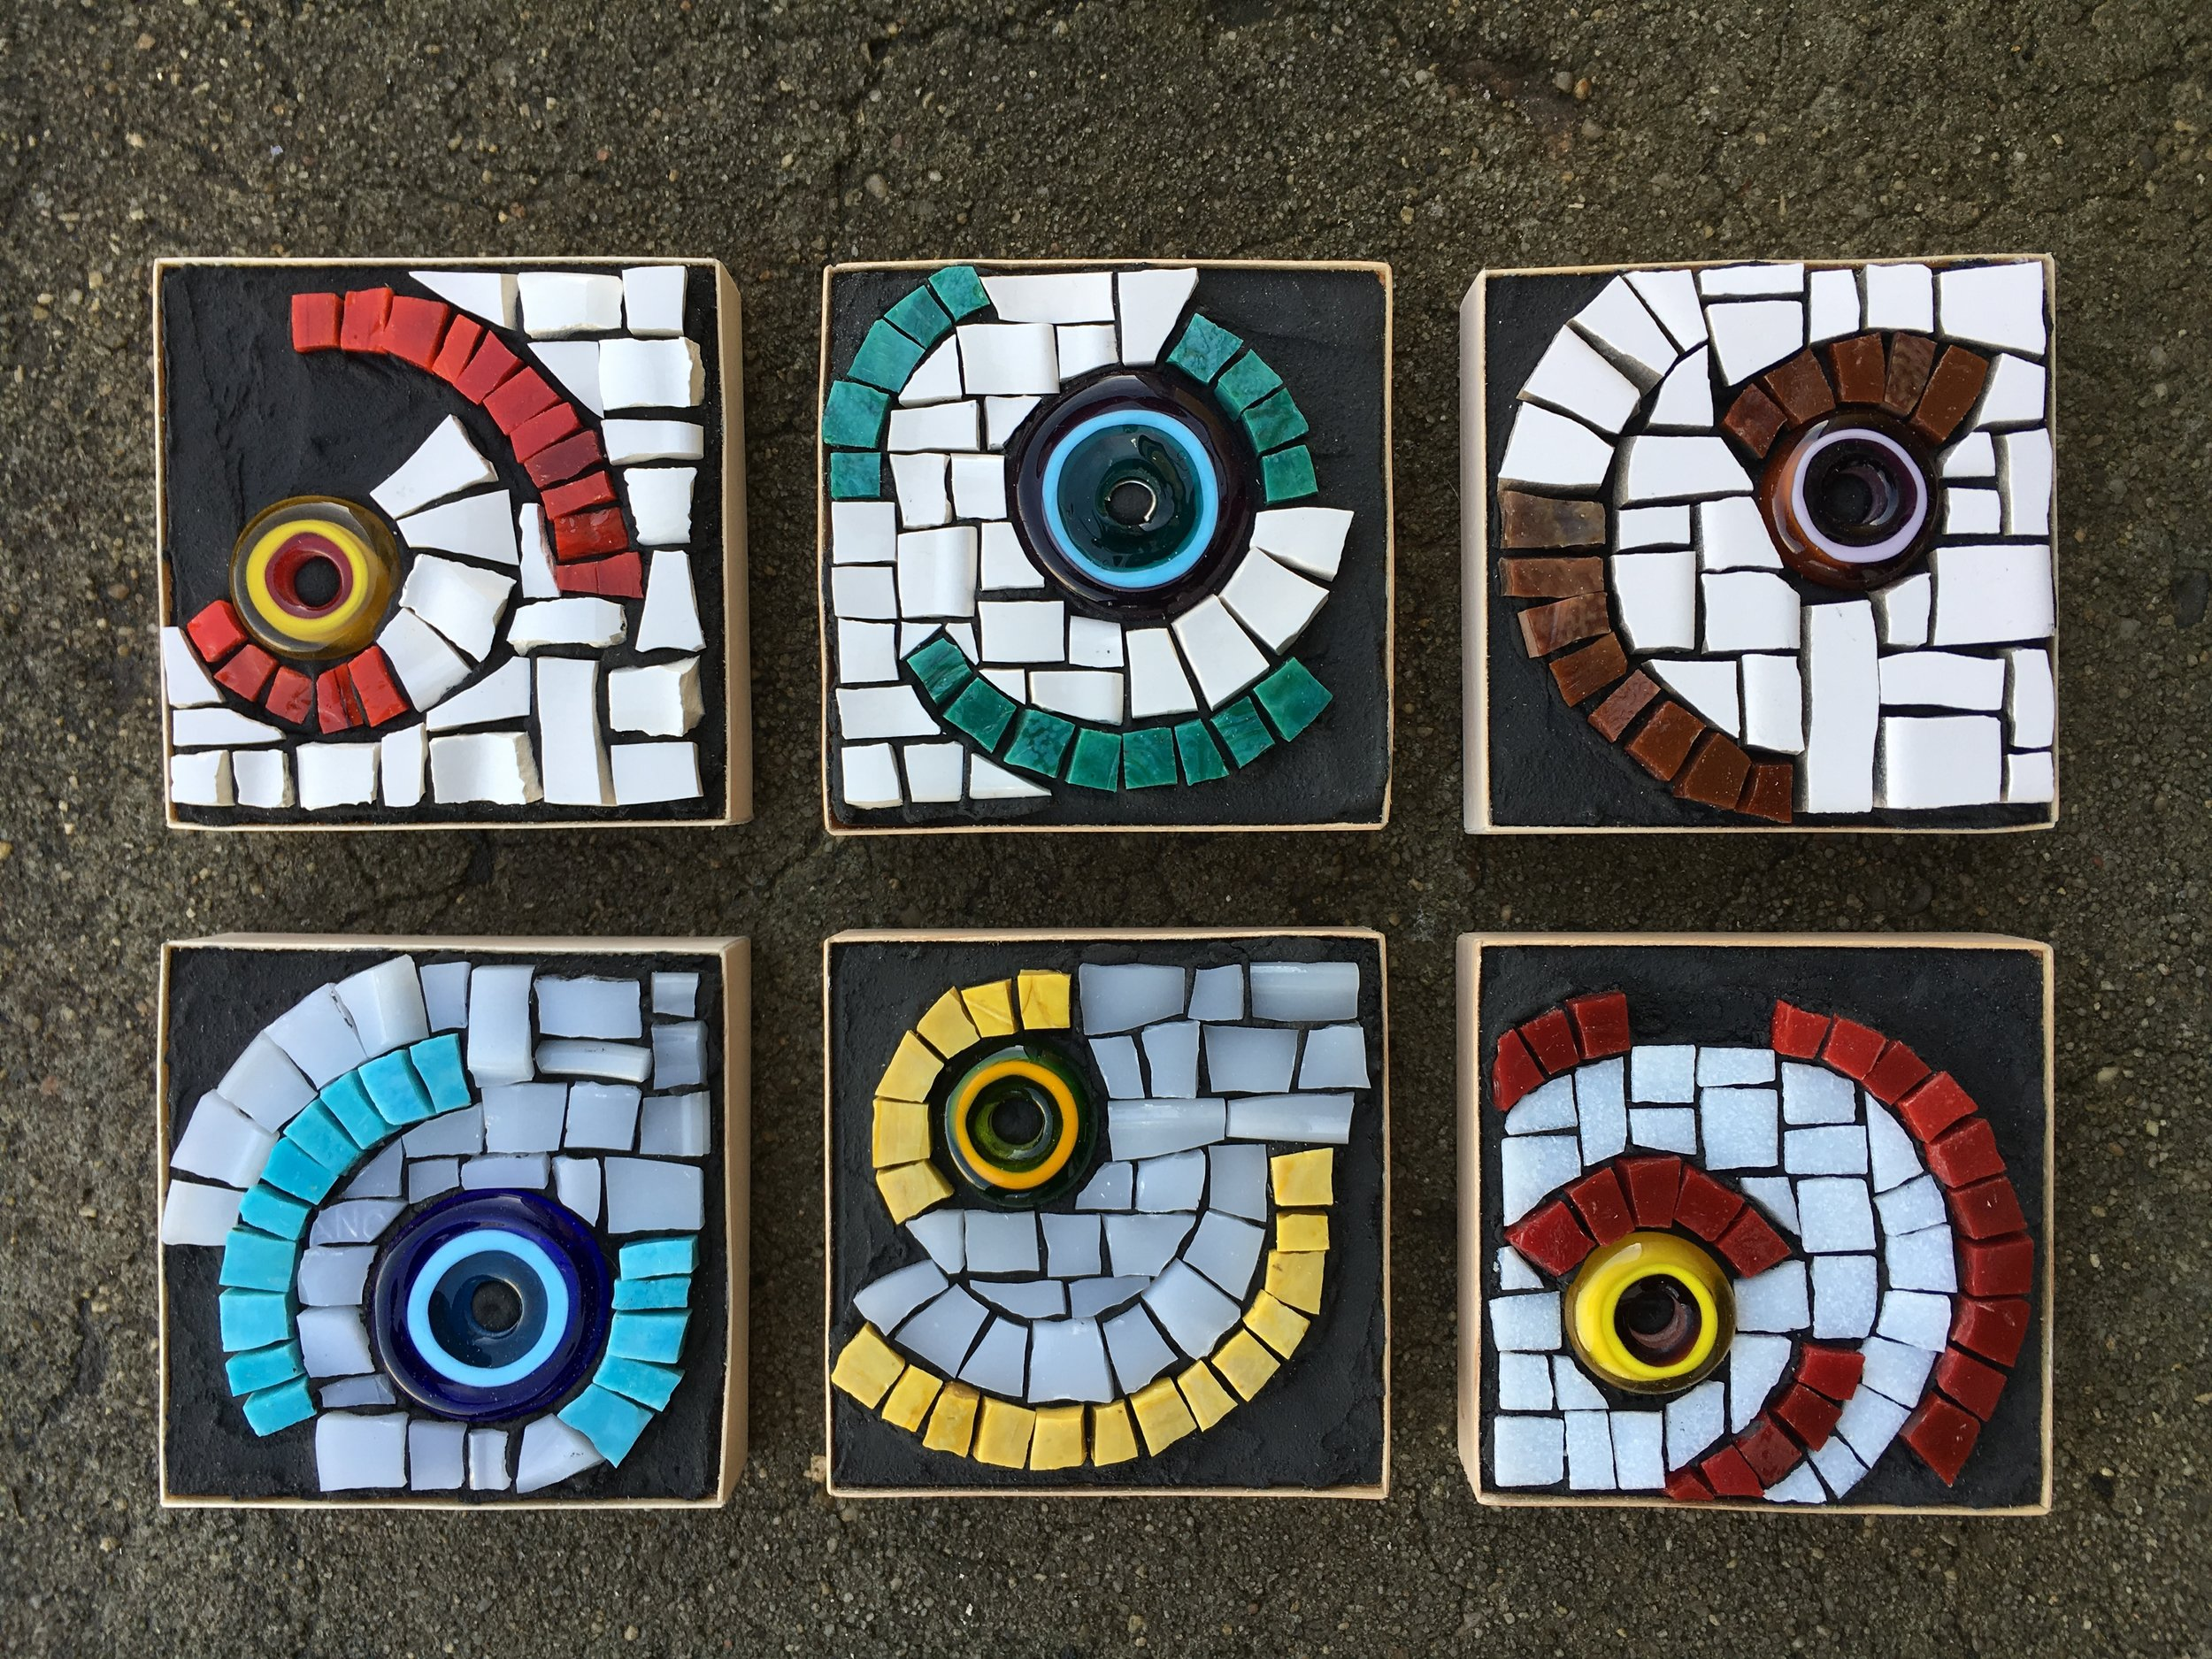 Glass bead mosaic series